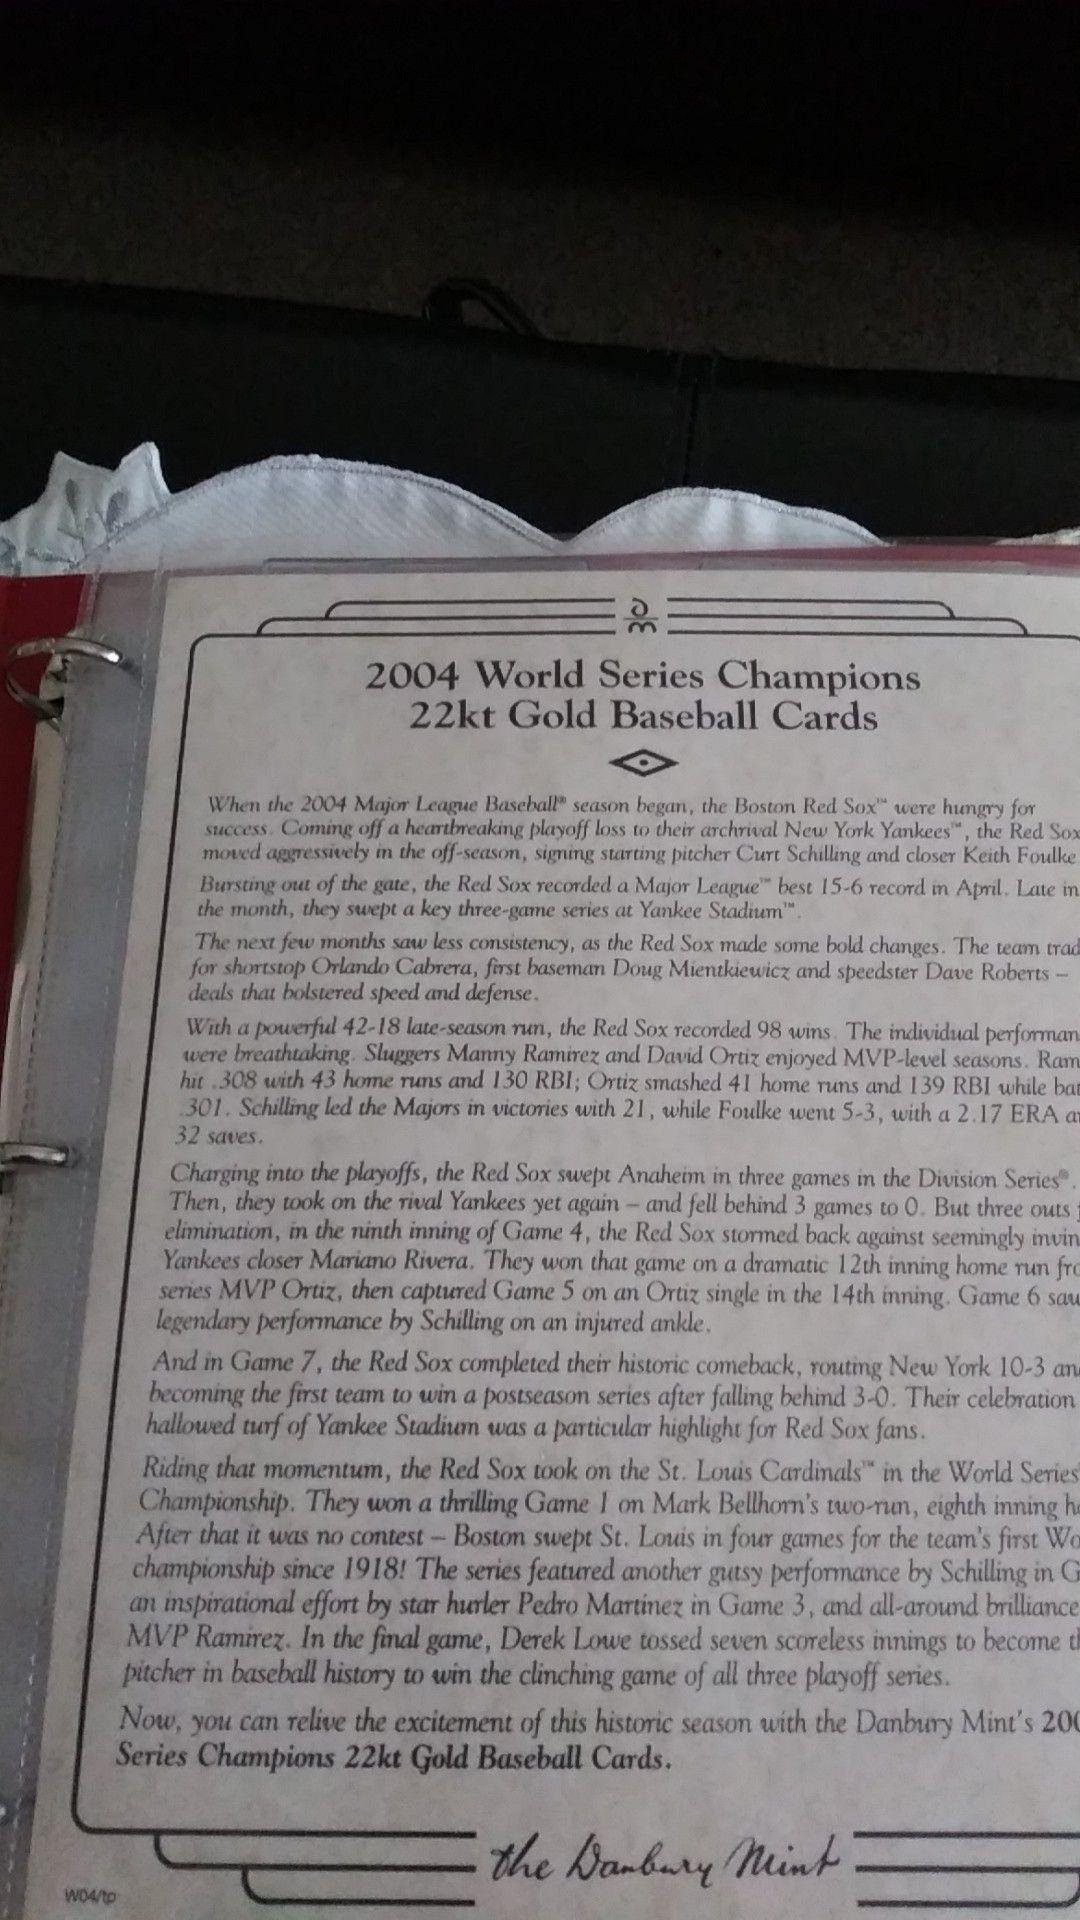 2004 world series 22kt gold Baseball Cards